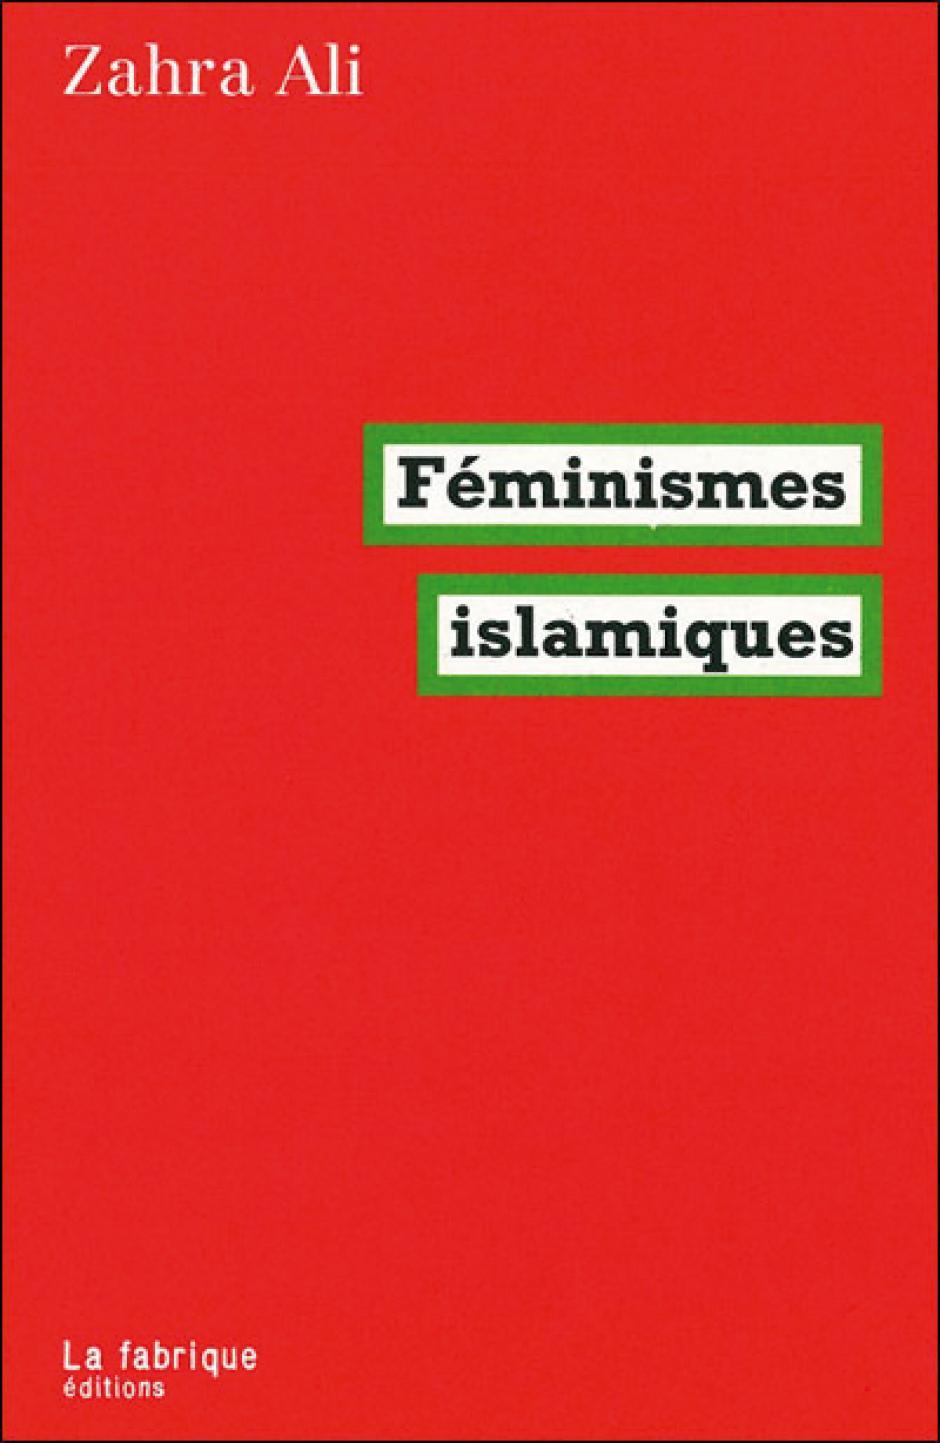 Féminismes islamiques, Zahra Ali